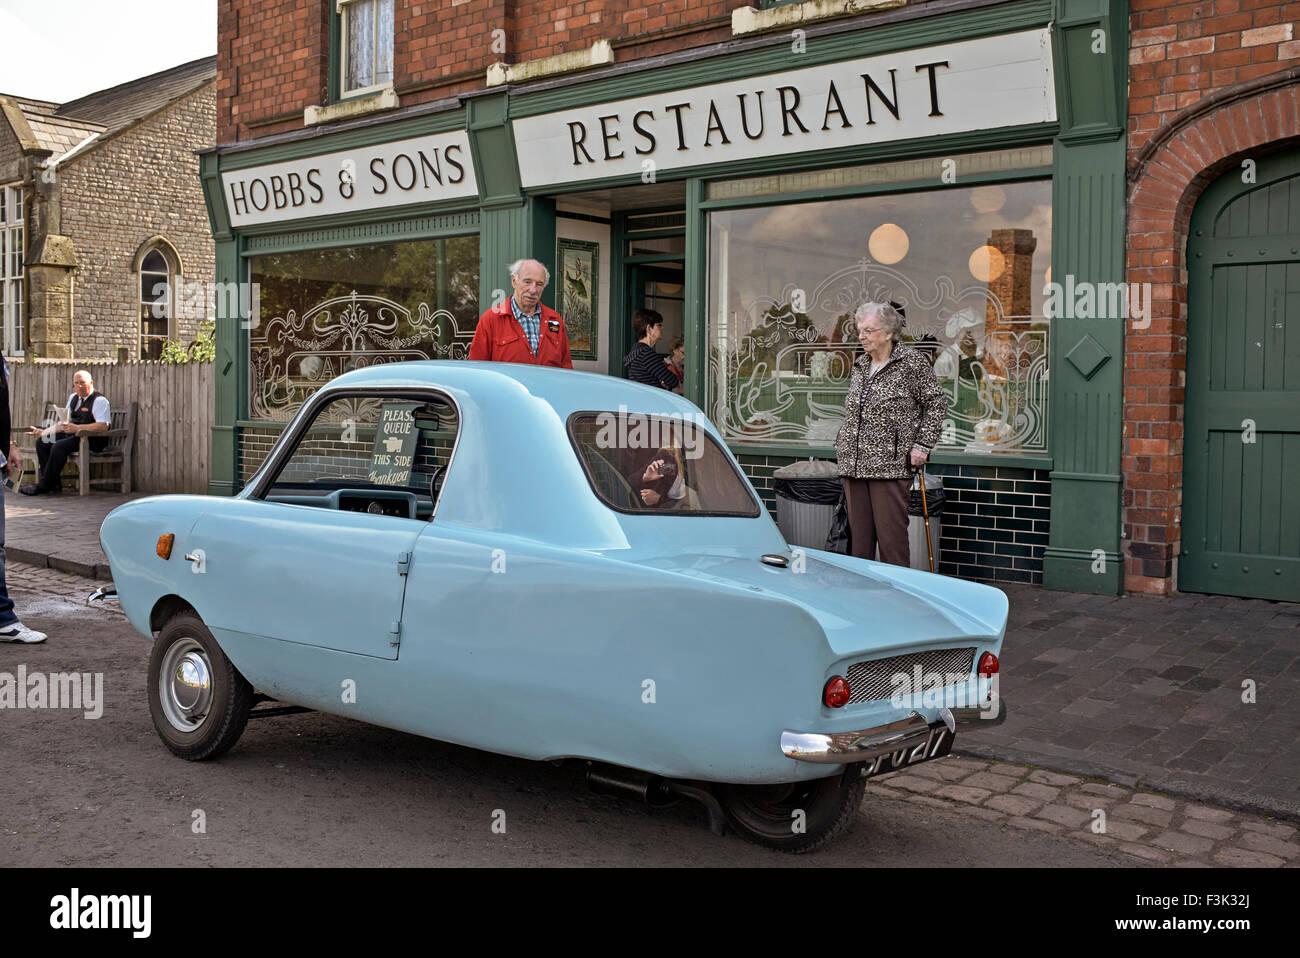 Vintage 1958 Quot Frisky Quot Fibreglass 3 Wheeled Car Made By